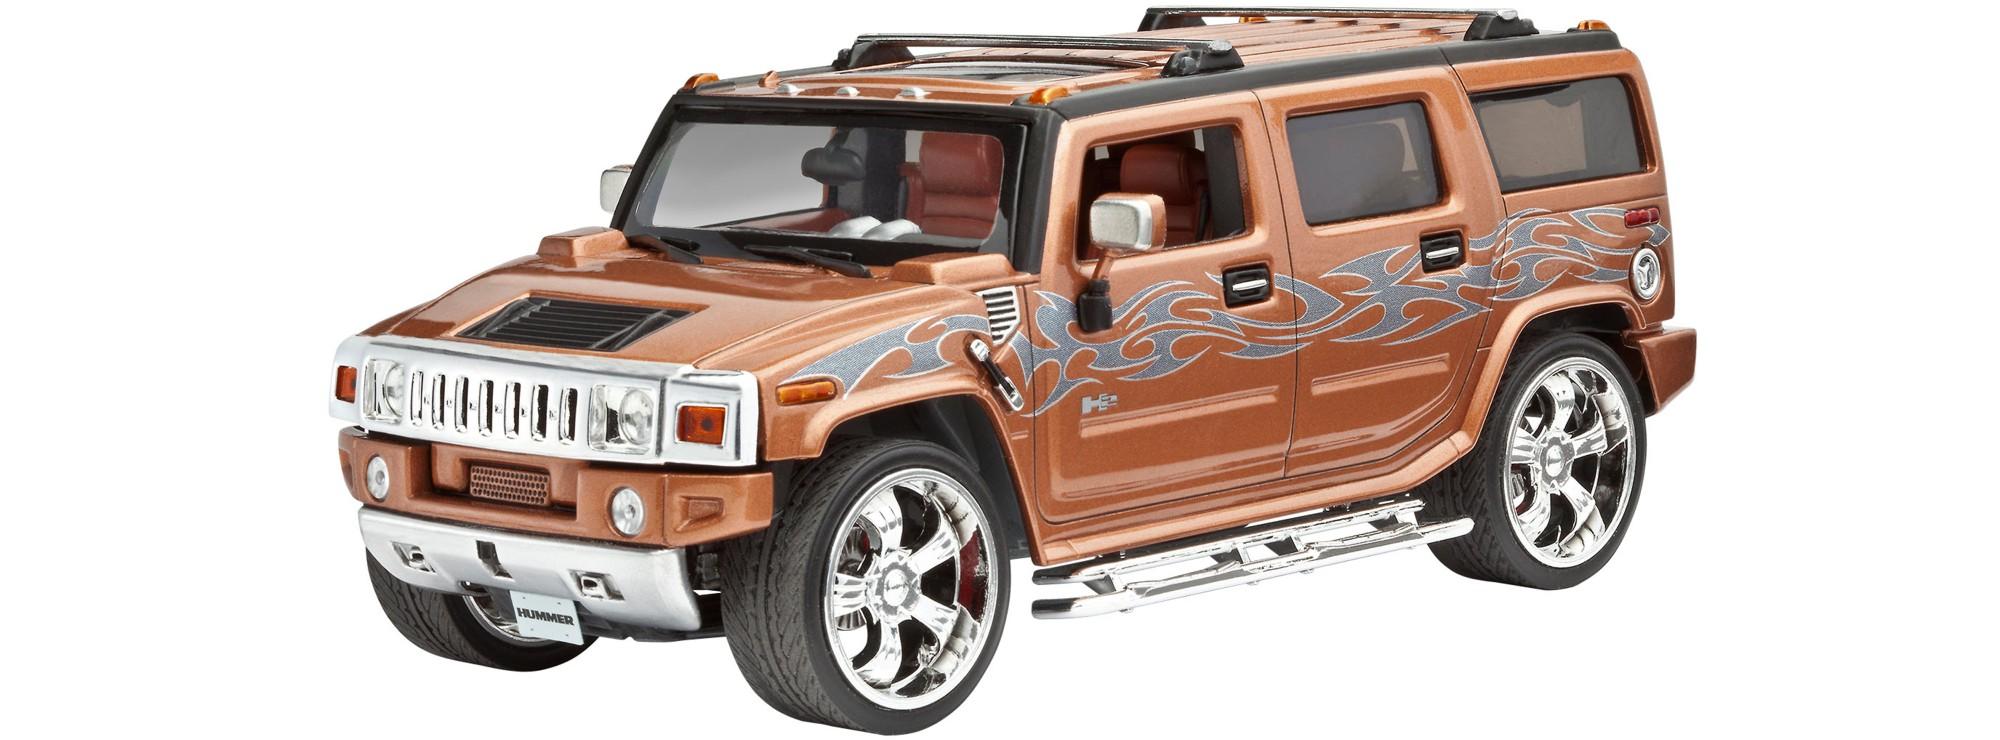 revell 07186 general motors hummer h2 auto bausatz 1 25 online kaufen bei modellbau h rtle. Black Bedroom Furniture Sets. Home Design Ideas